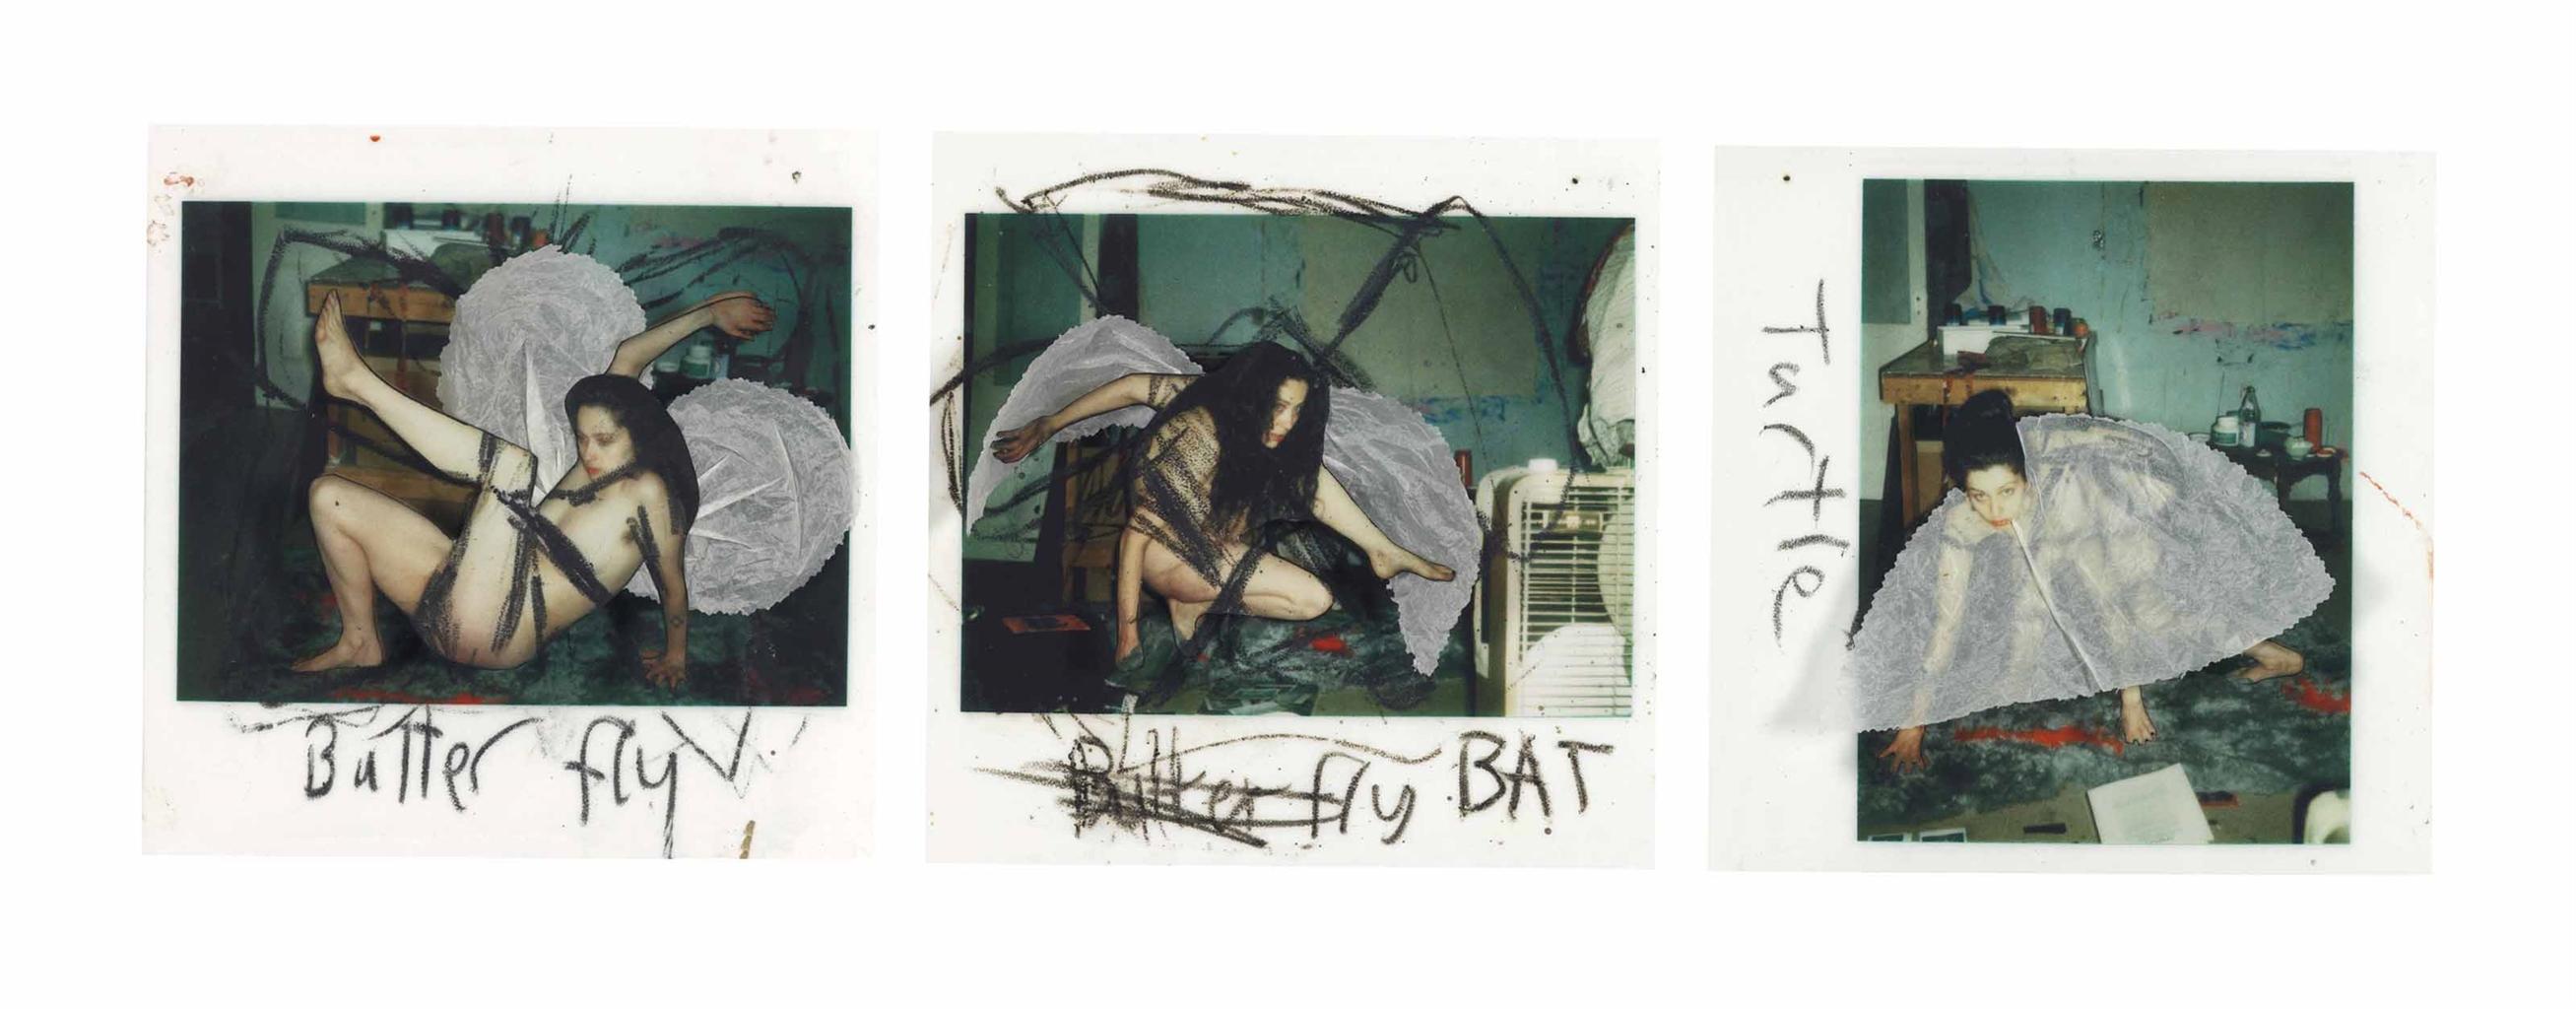 Kiki Smith-Butterfly, Bat, Turtle-2000